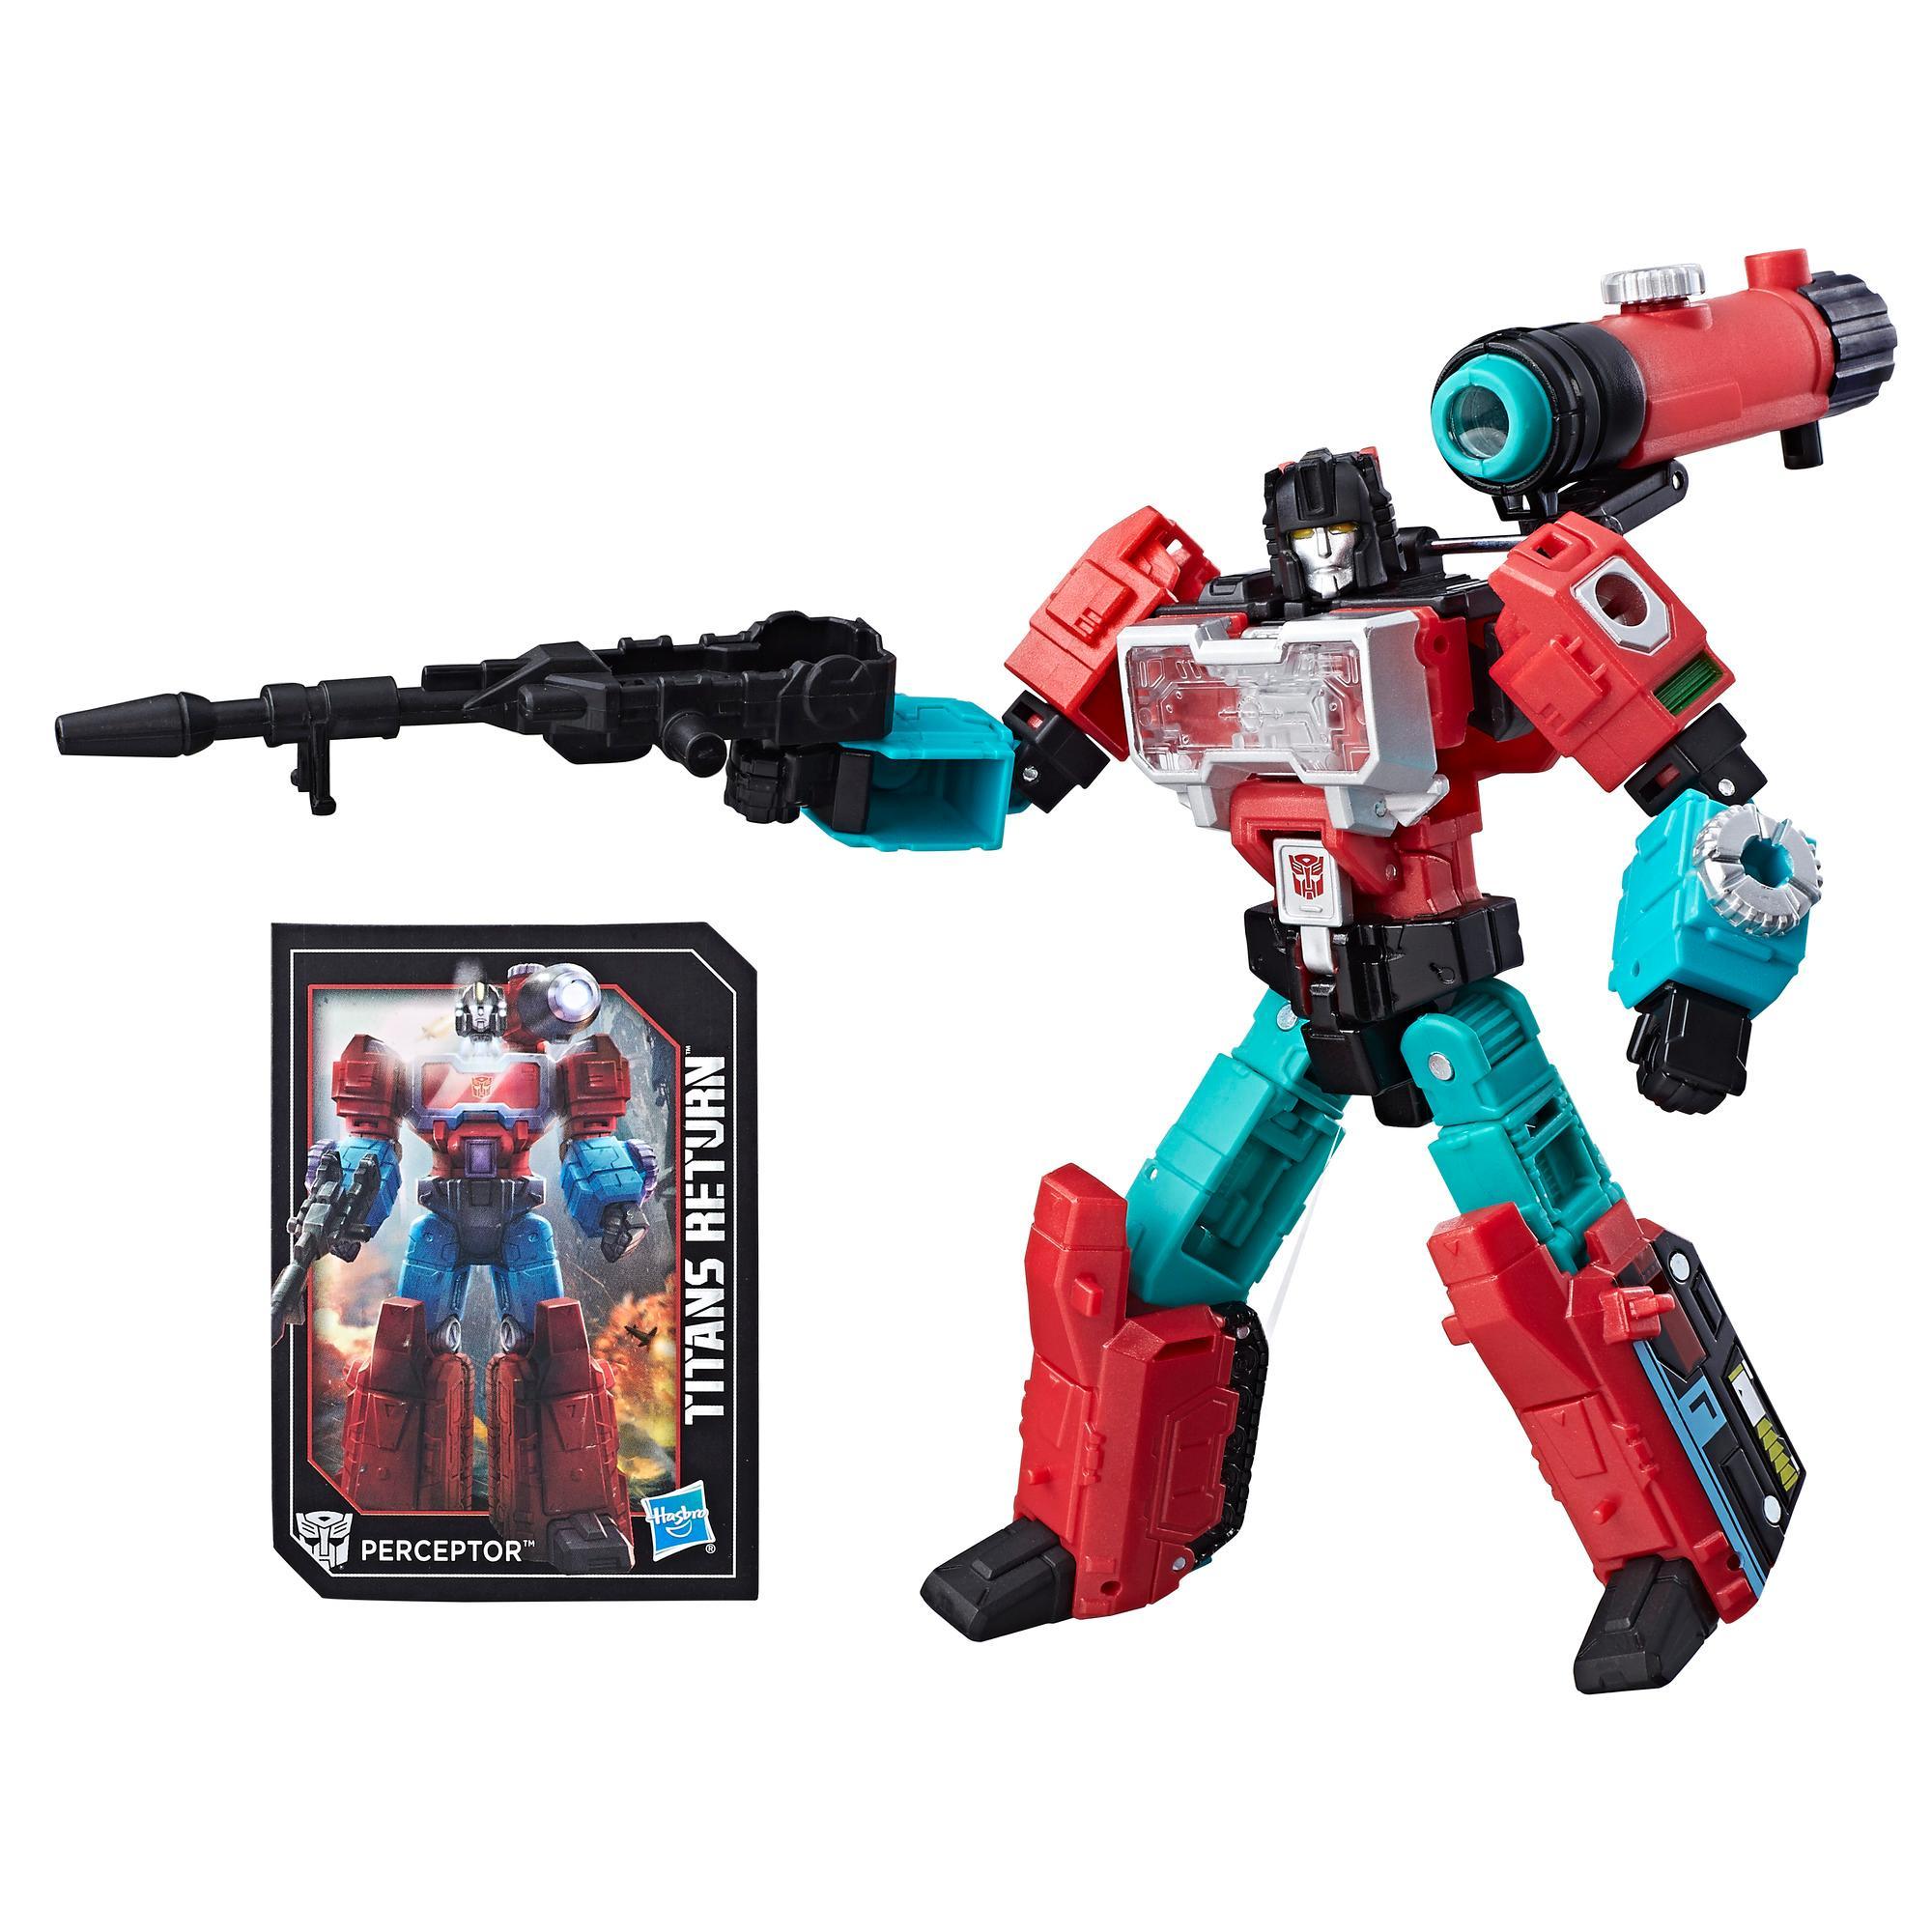 Transformers Generation Deluxe Titan War PERCEPTOR